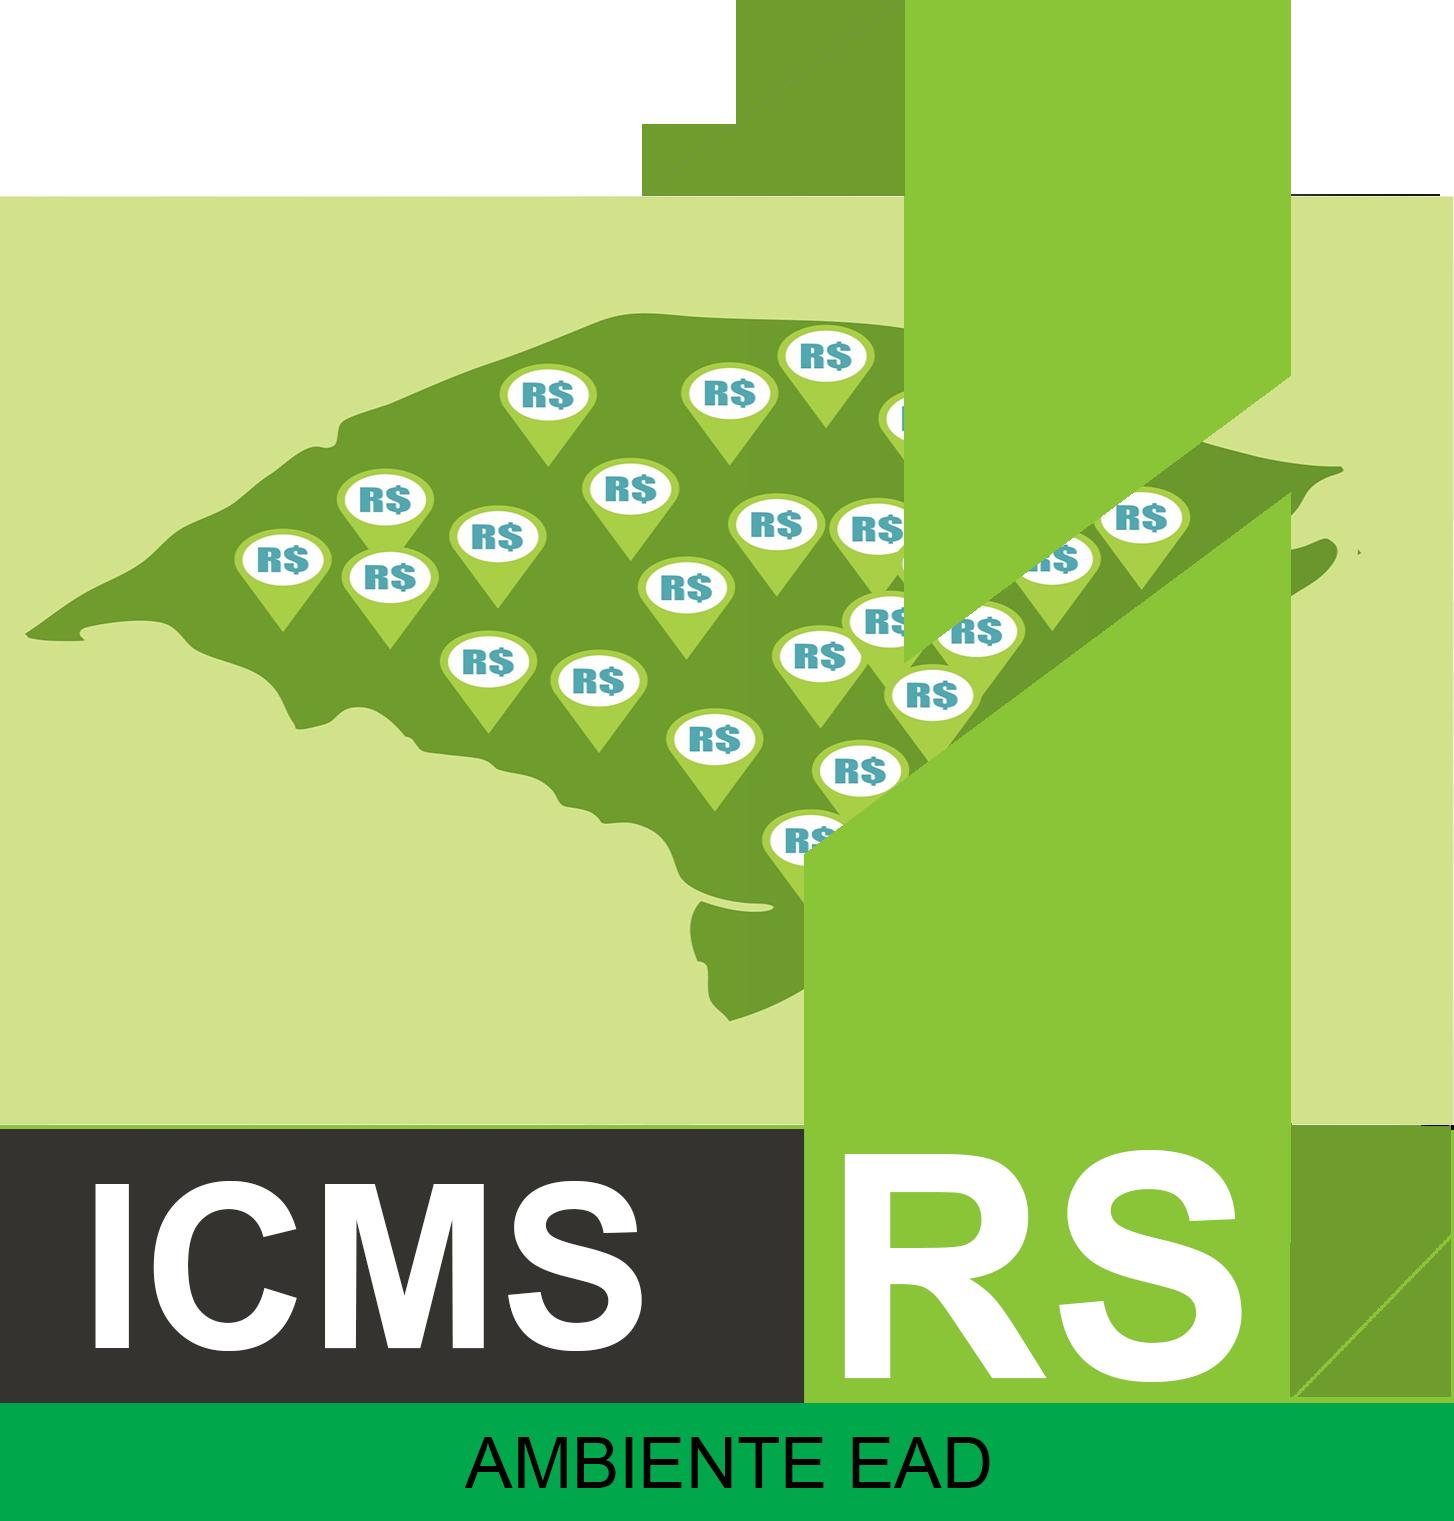 Icms%20rs